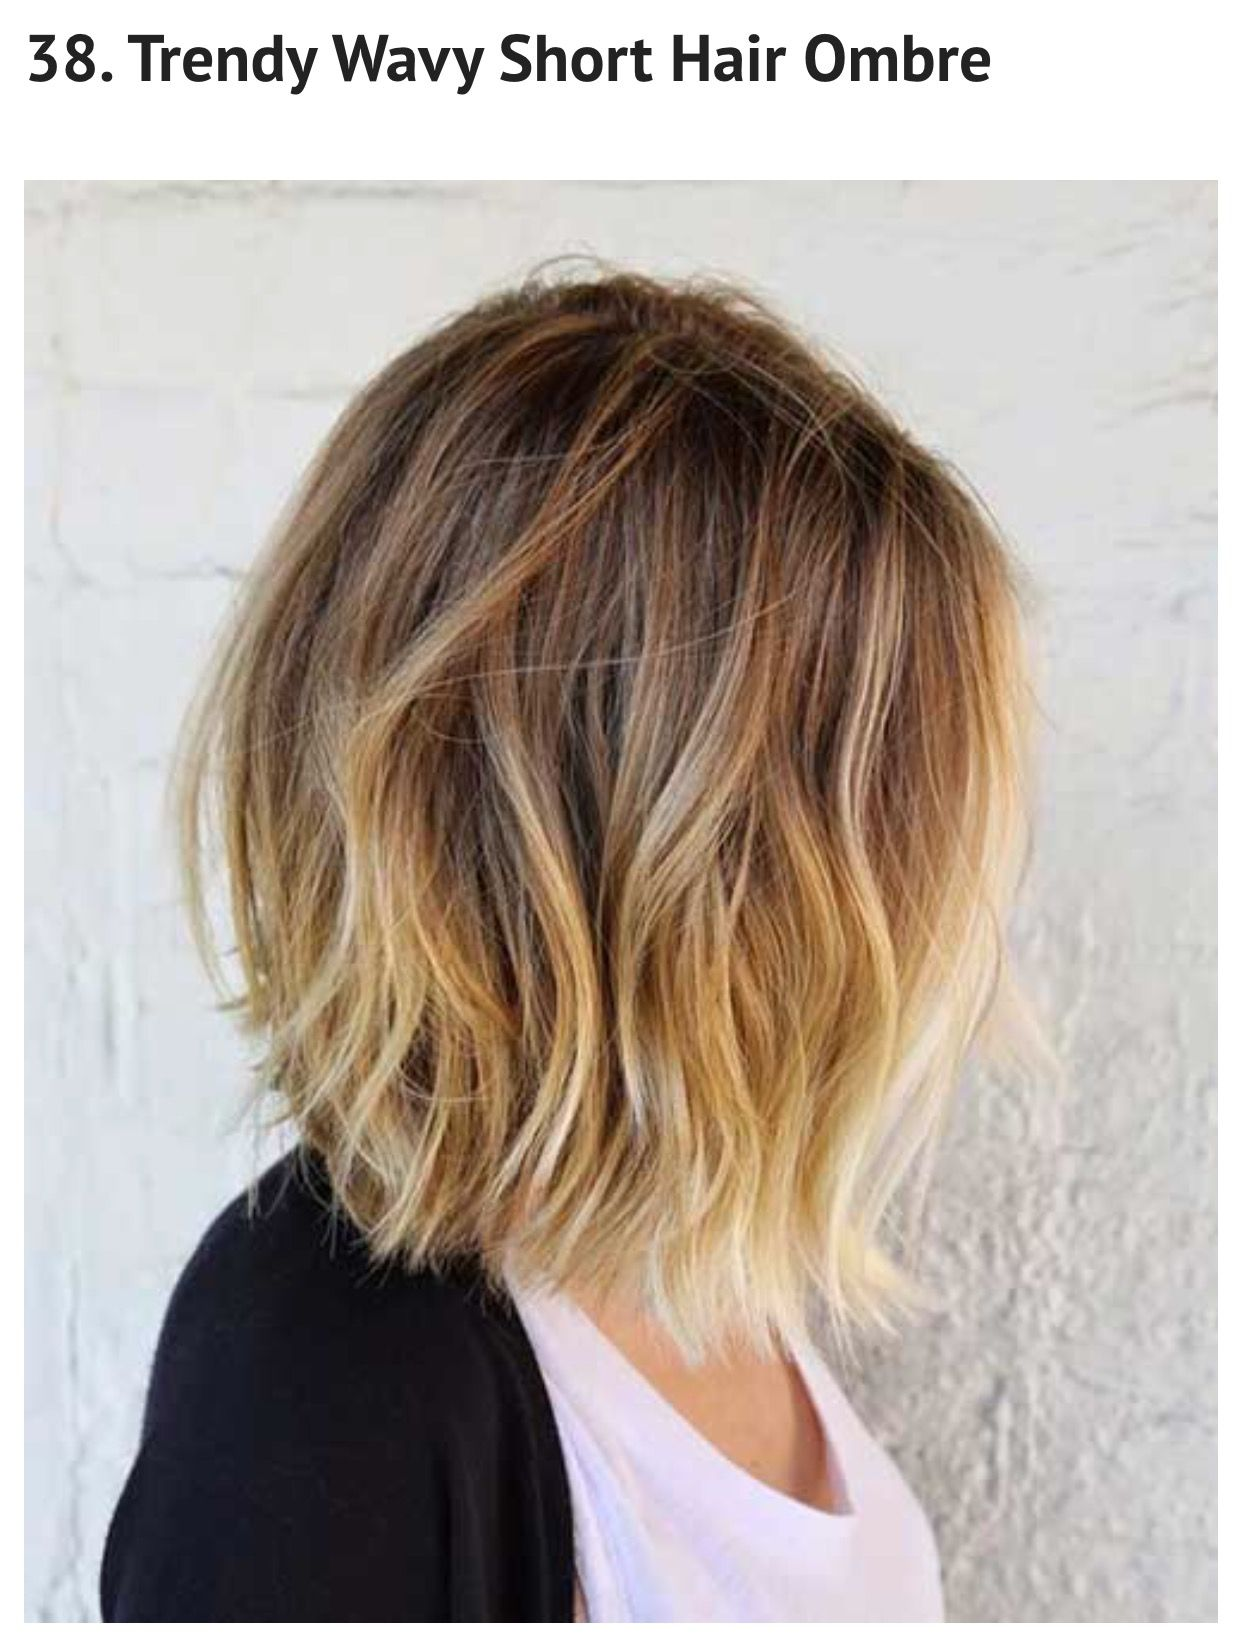 Pin by sandra de medeiros on hair pinterest